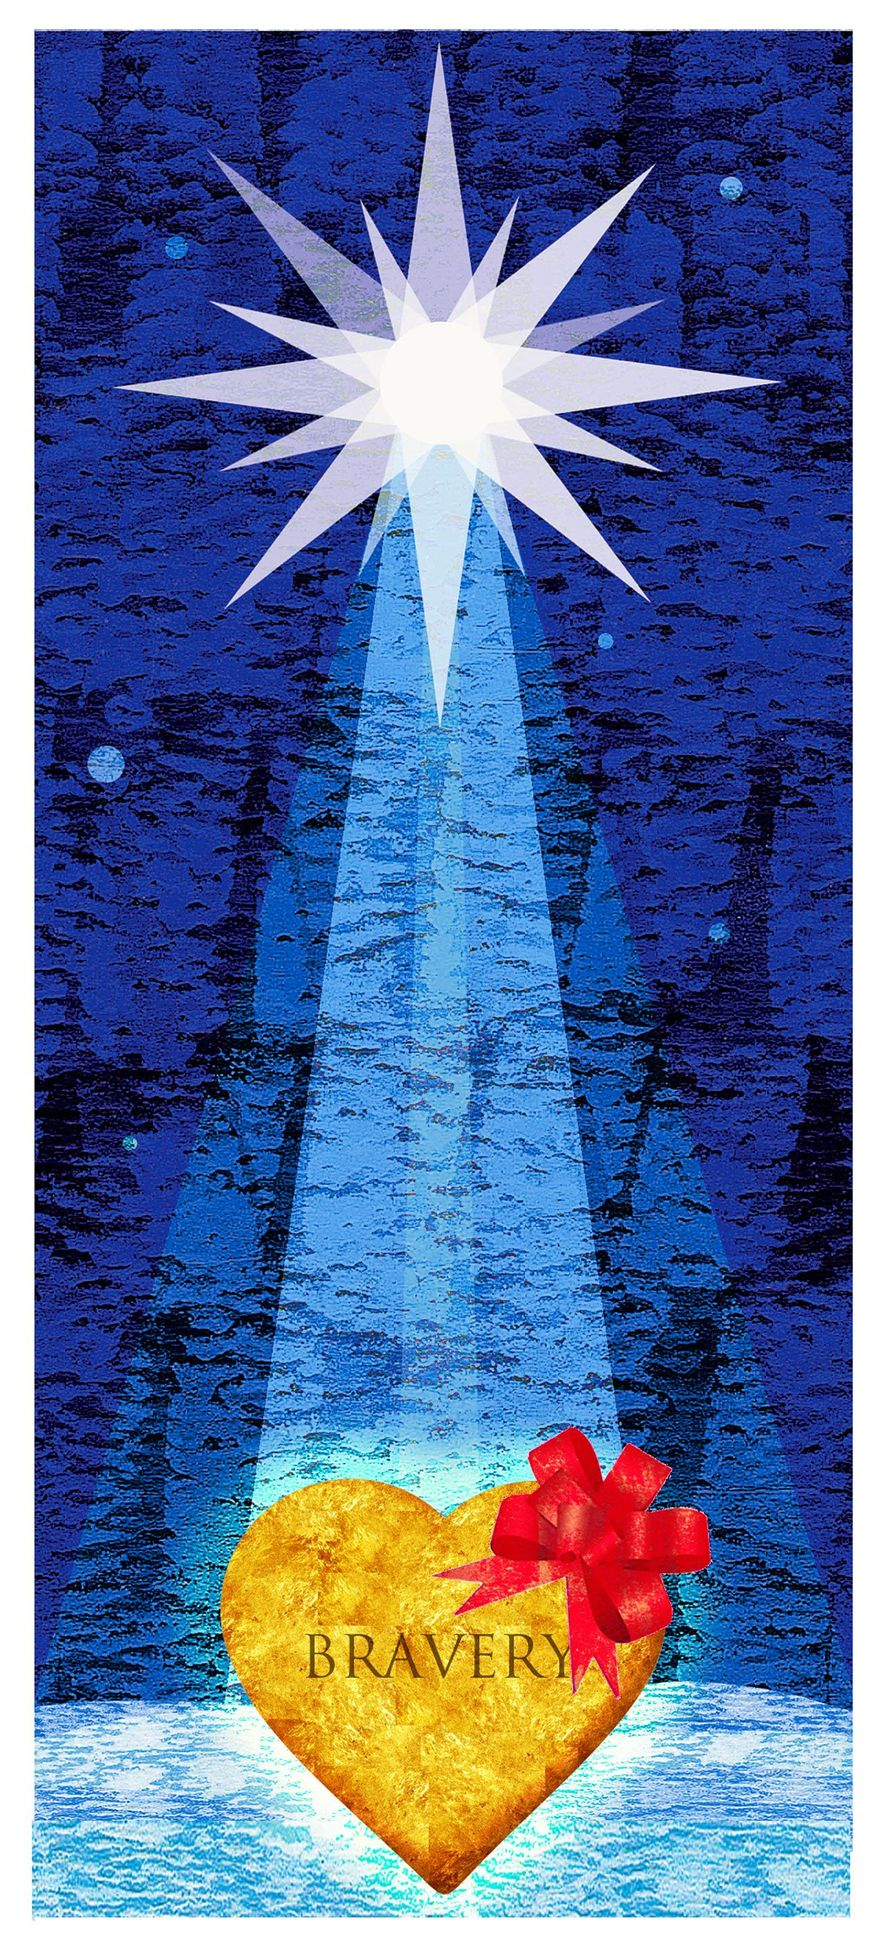 Illustration on the spirit of Christmas by Alexander Hunter/The Washington Times